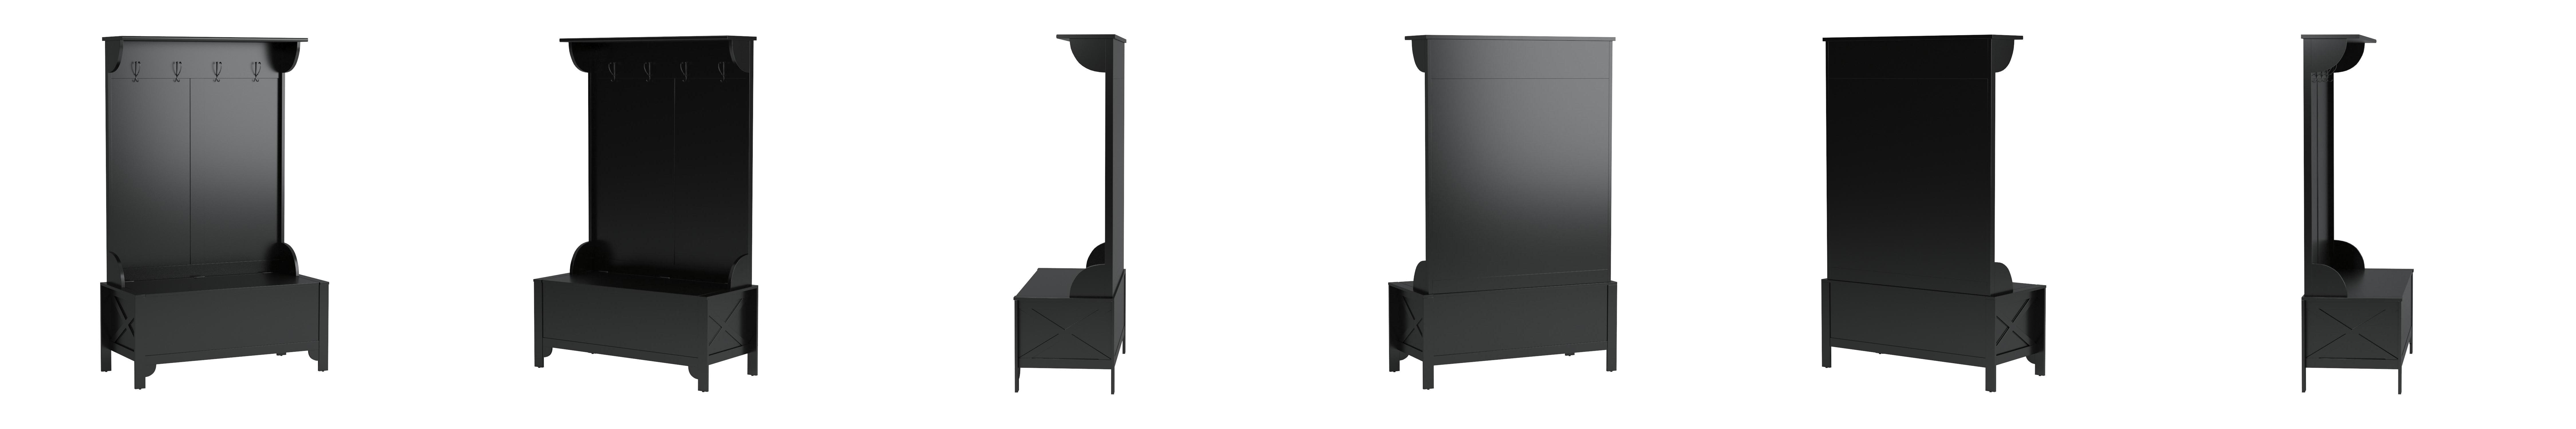 Cymax Furniture And Home Decor   Amazon Com Linon Home Decor Anna Hall Tree  Wide Bench